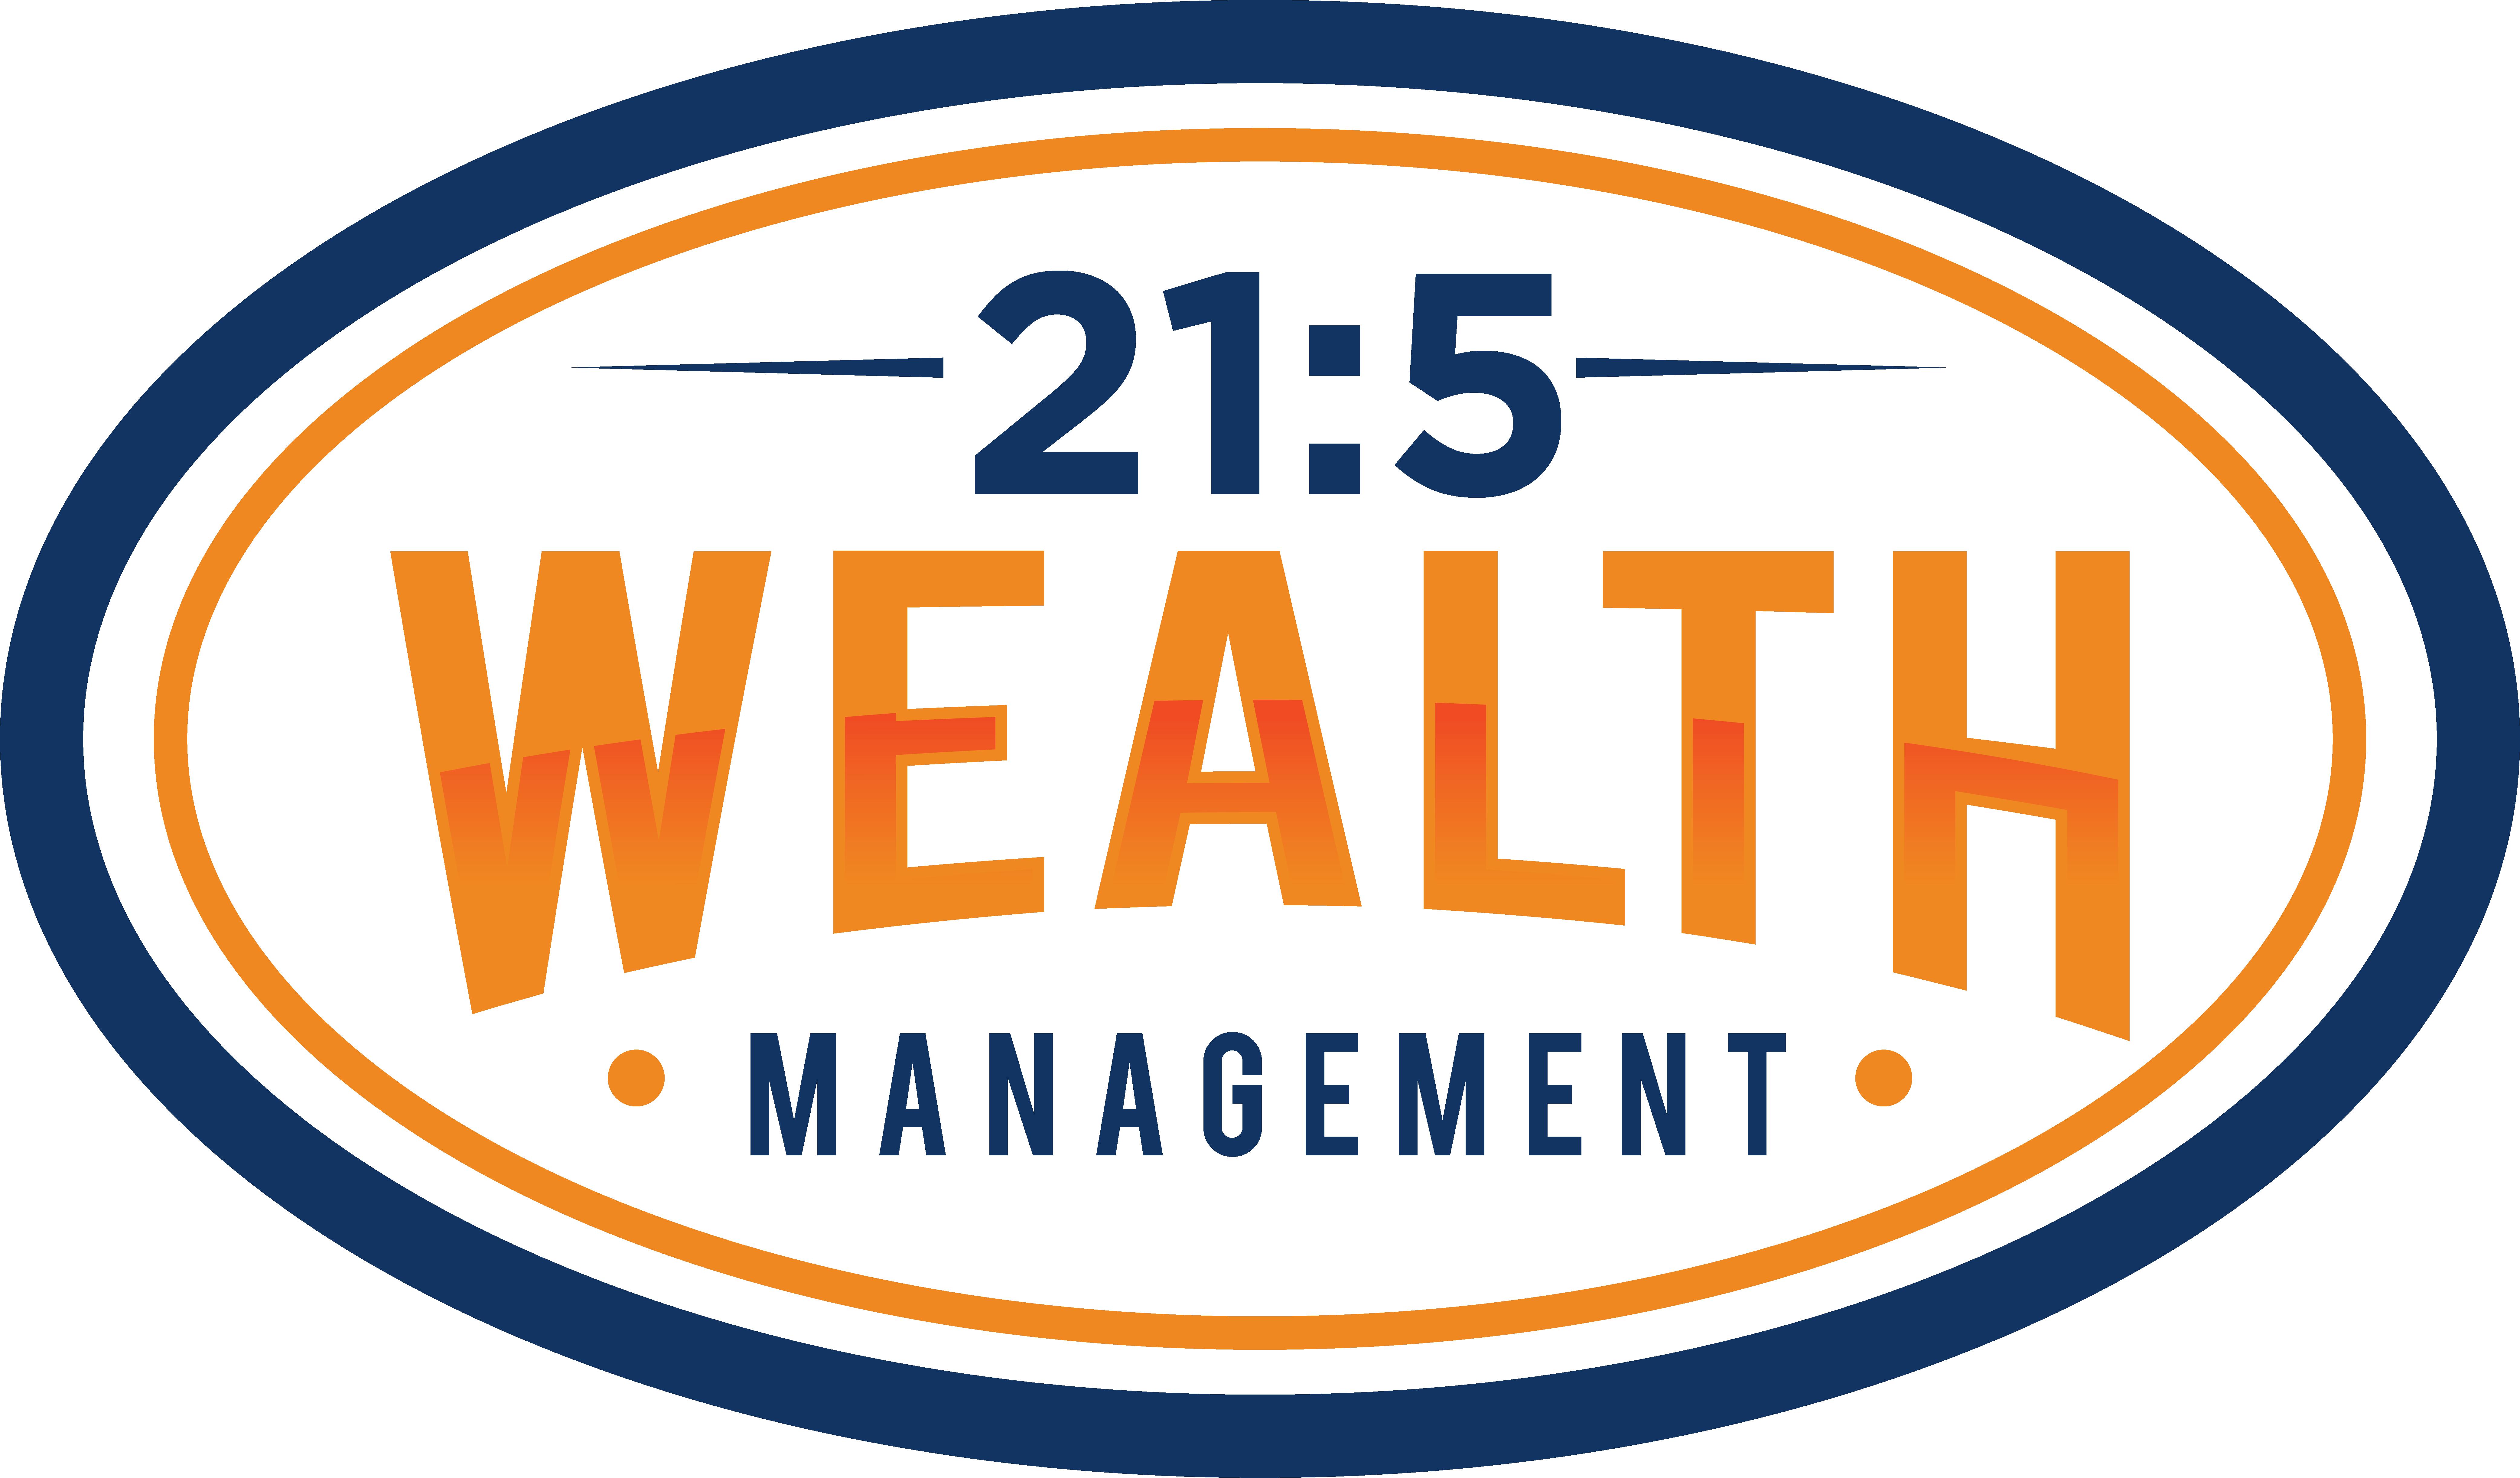 21:5 Wealth Management